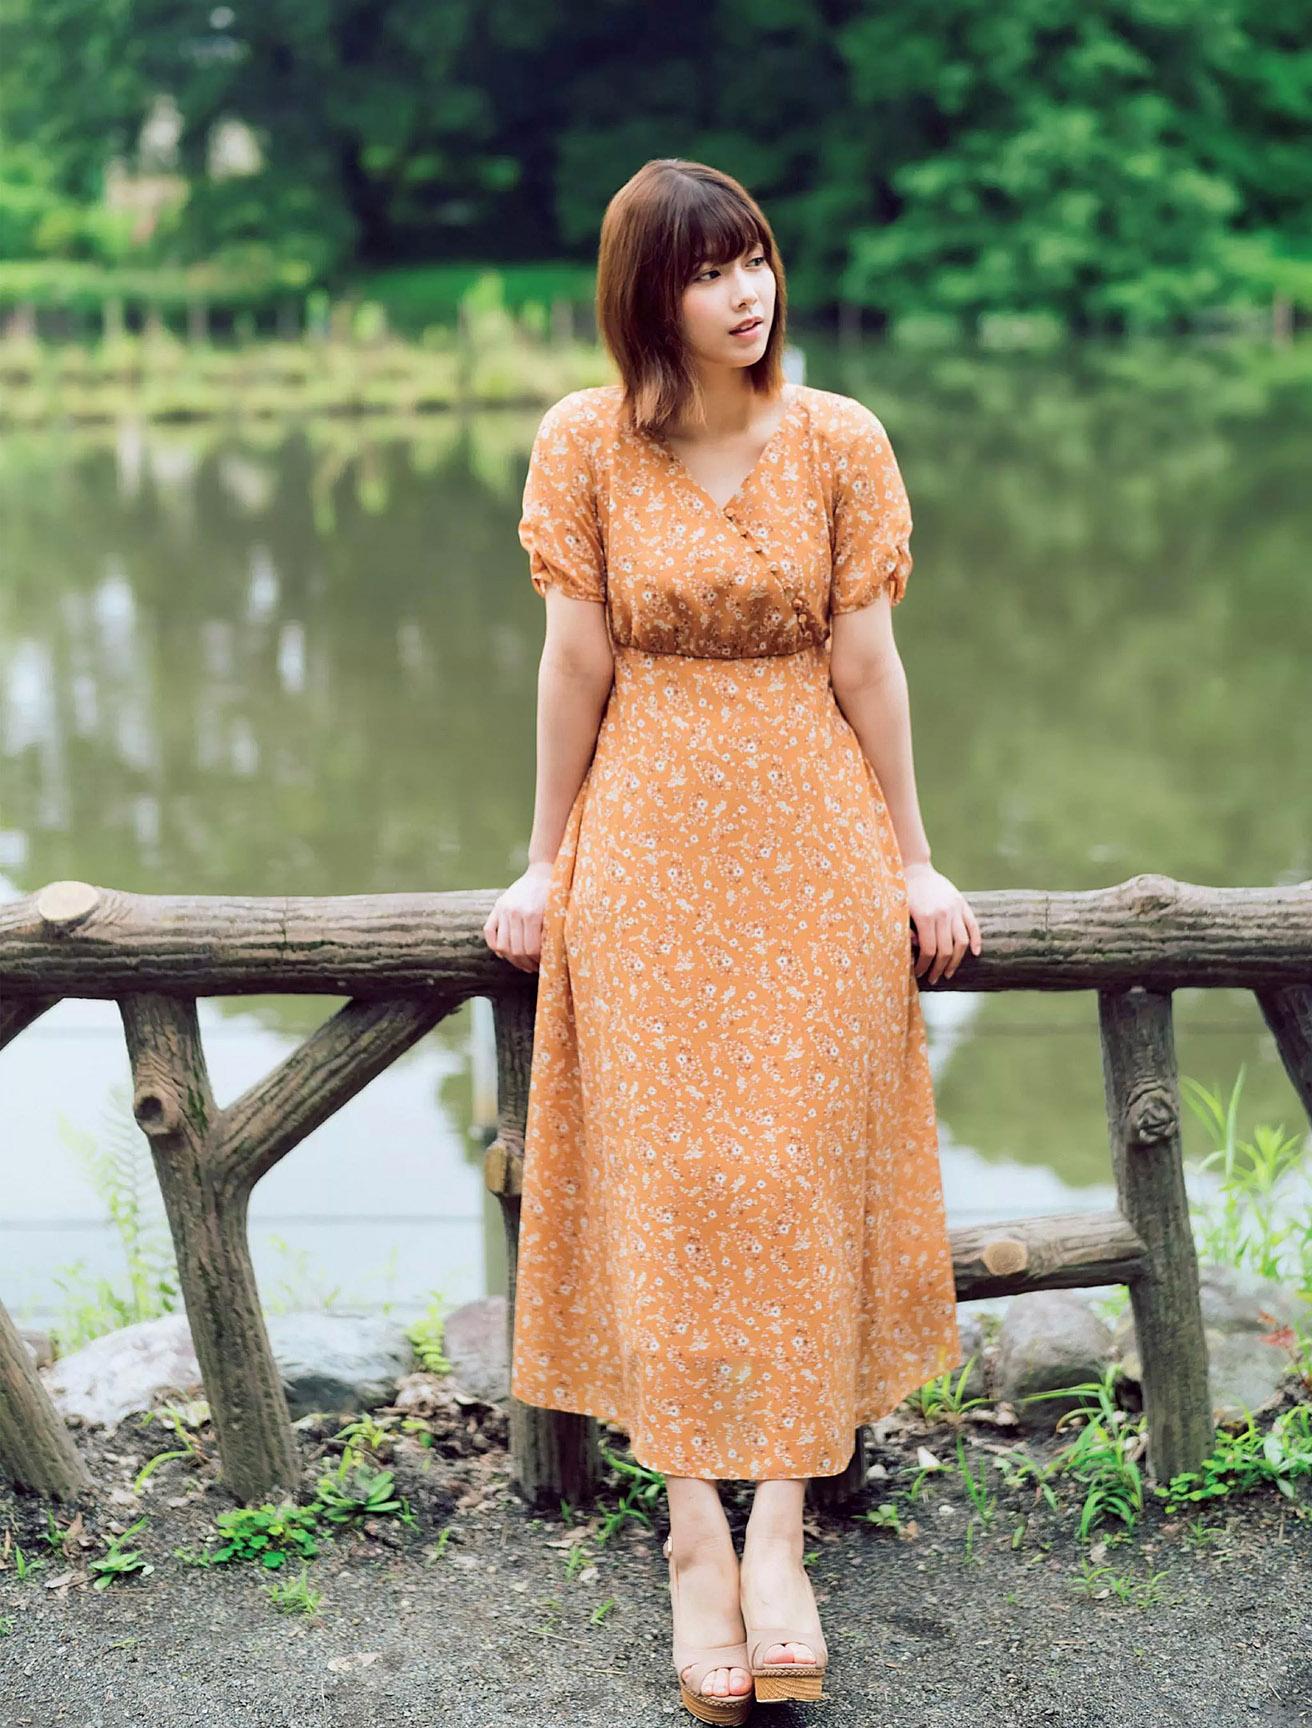 Risa Watanabe Flash 190910 03.jpg